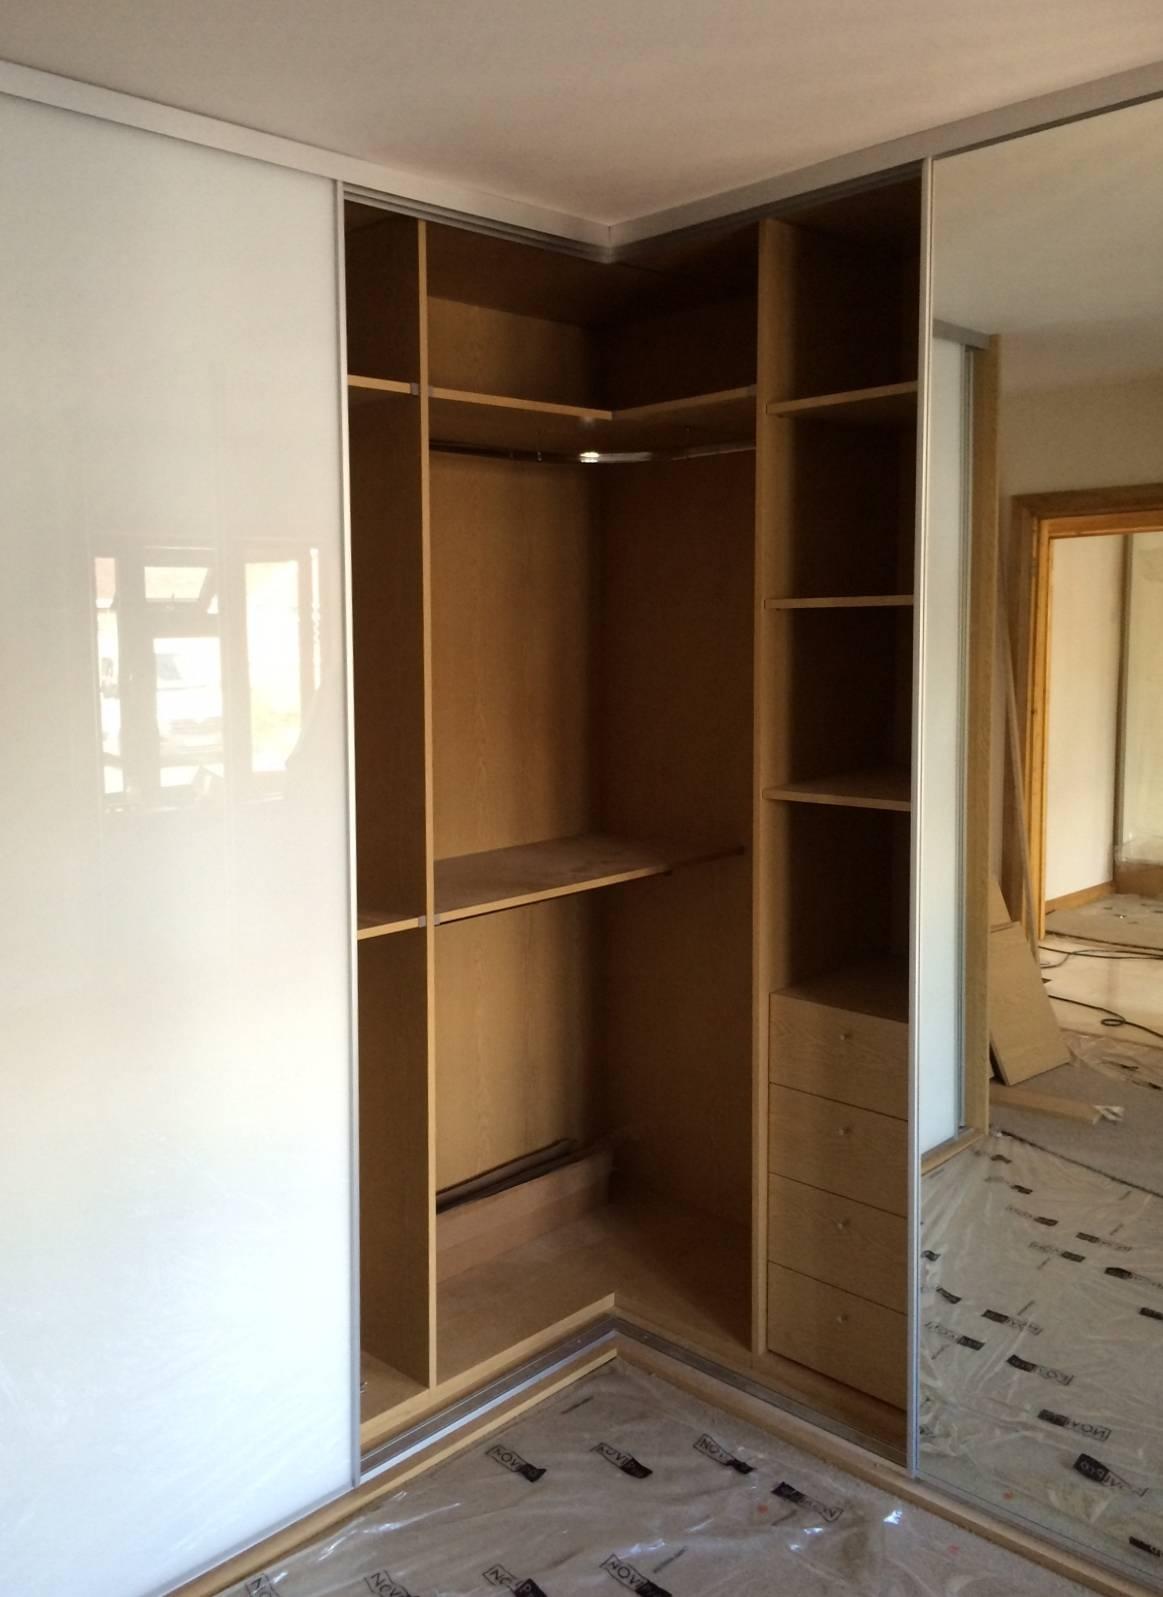 Sliding Wardrobe Doors And Wardrobe Interiors | Corner & L Shaped pertaining to Curved Wardrobe Doors (Image 19 of 30)